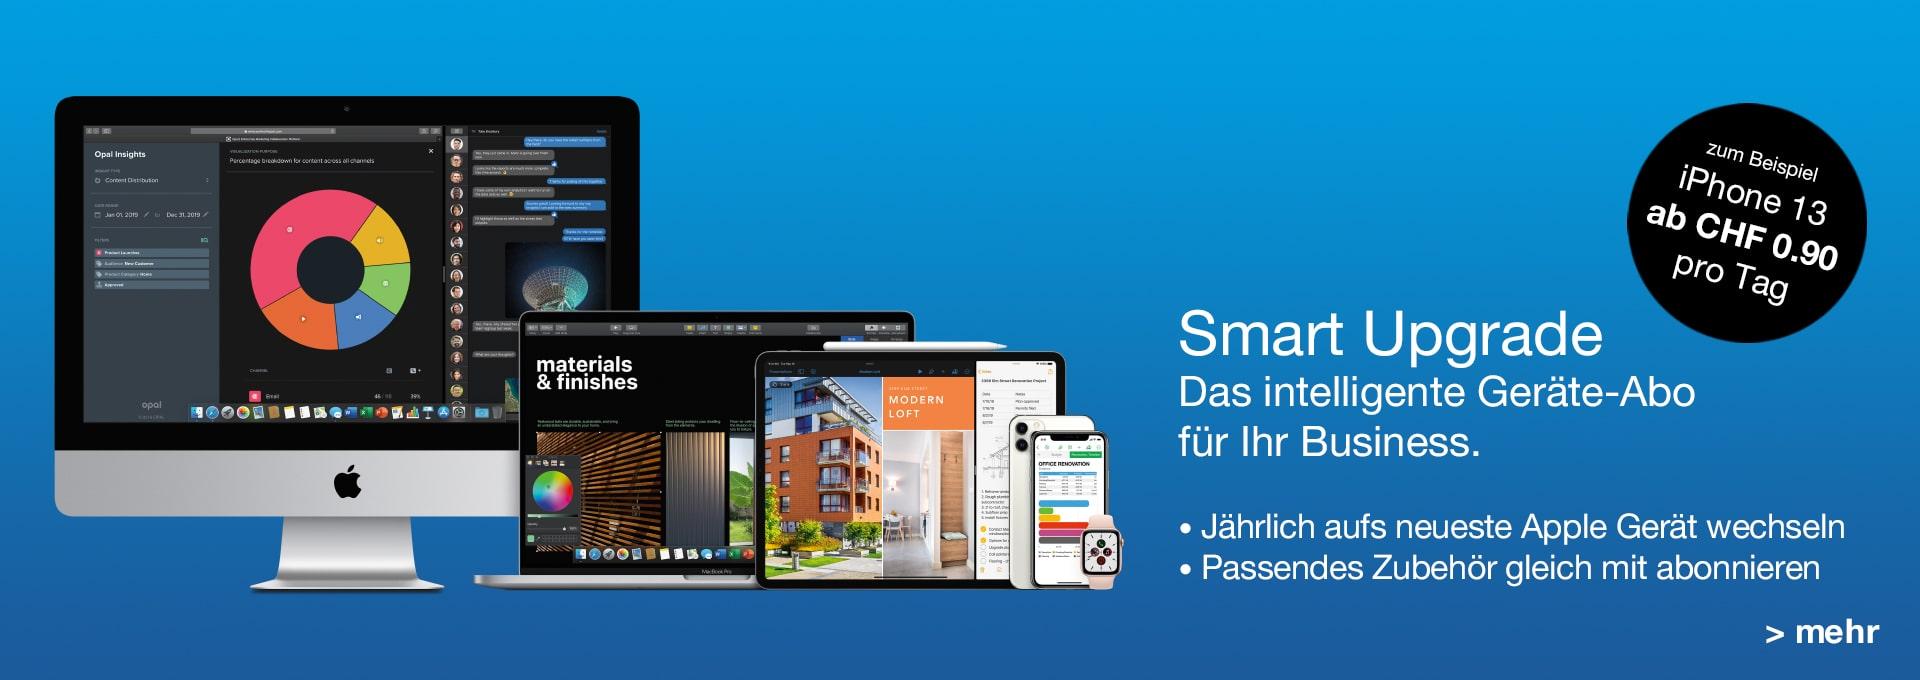 B2B - Smart Upgrade - Geräteabo für Business